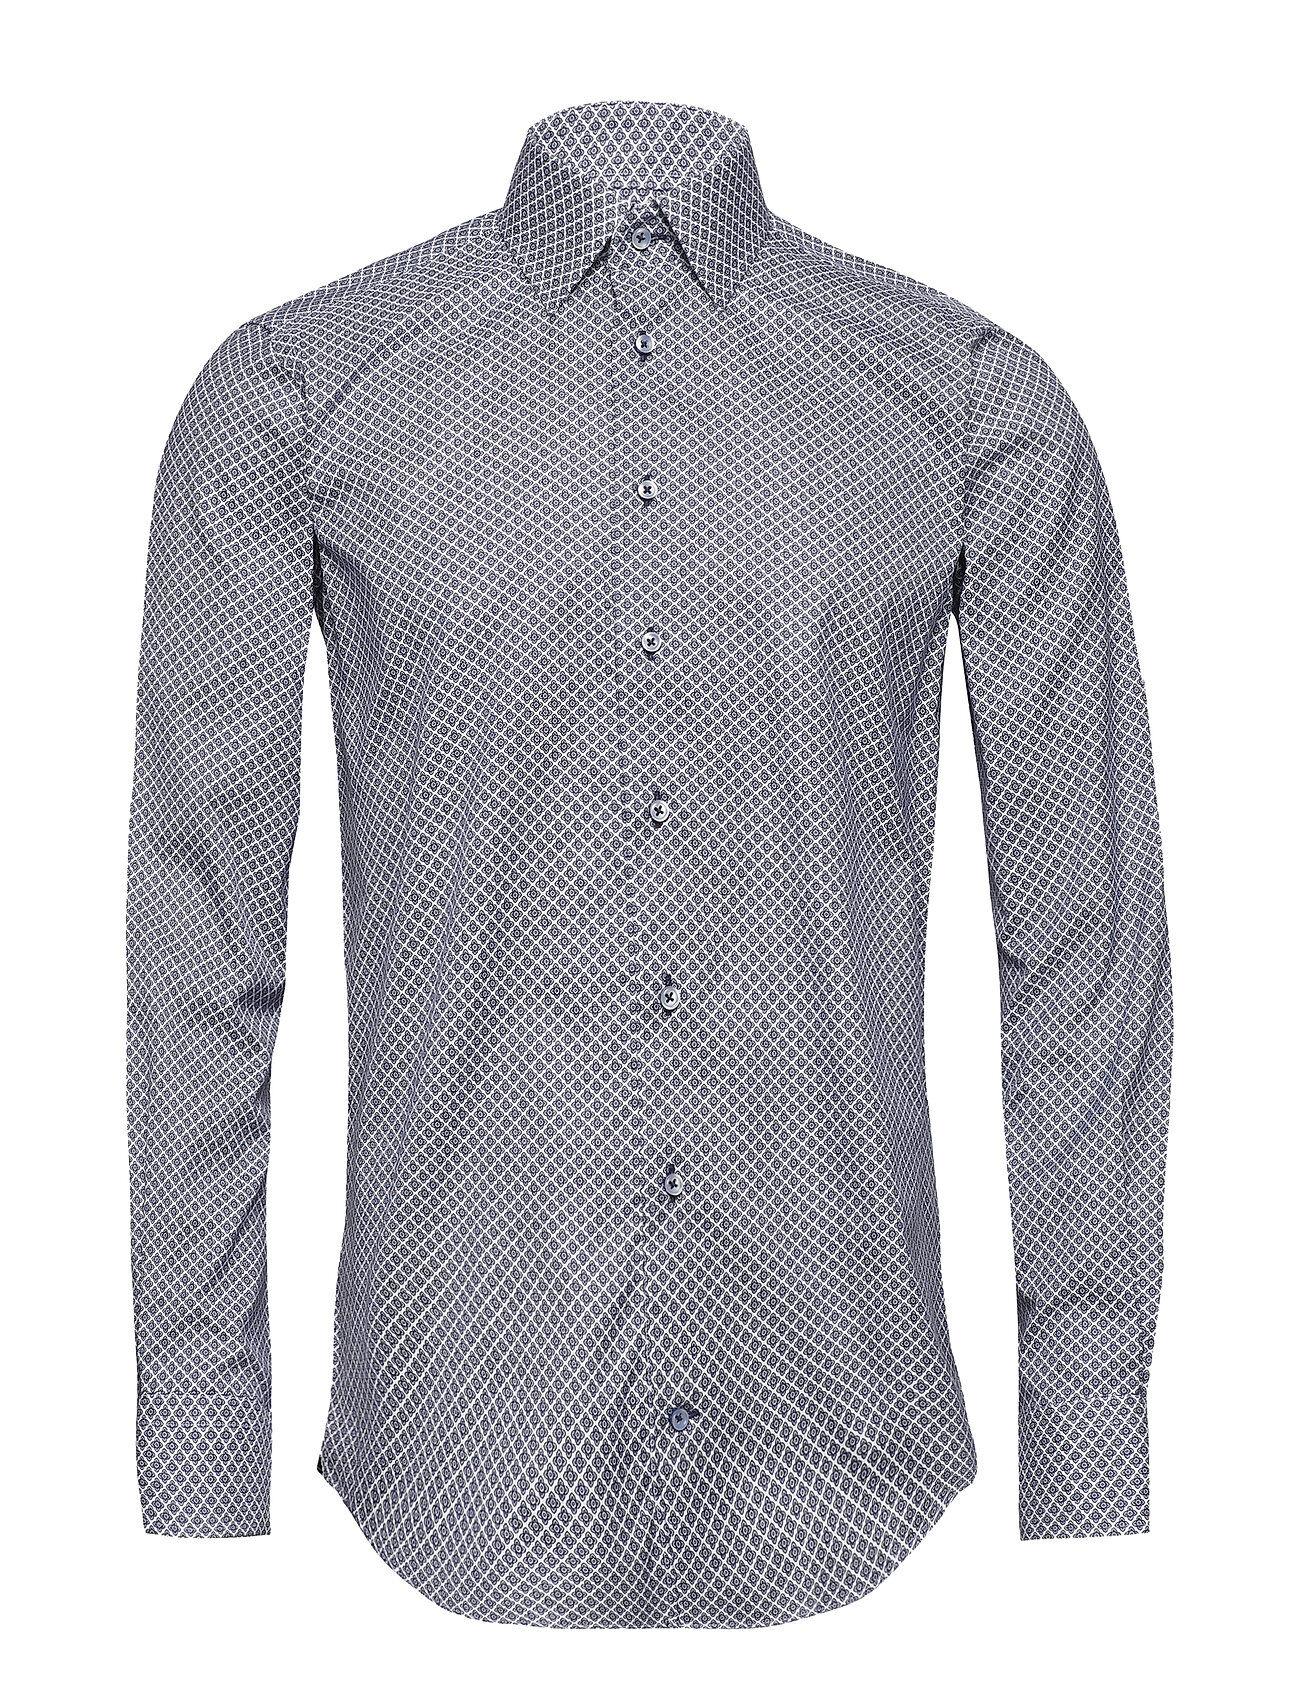 XO Shirtmaker by Sand Copenhagen 8086 - Gordon Sc